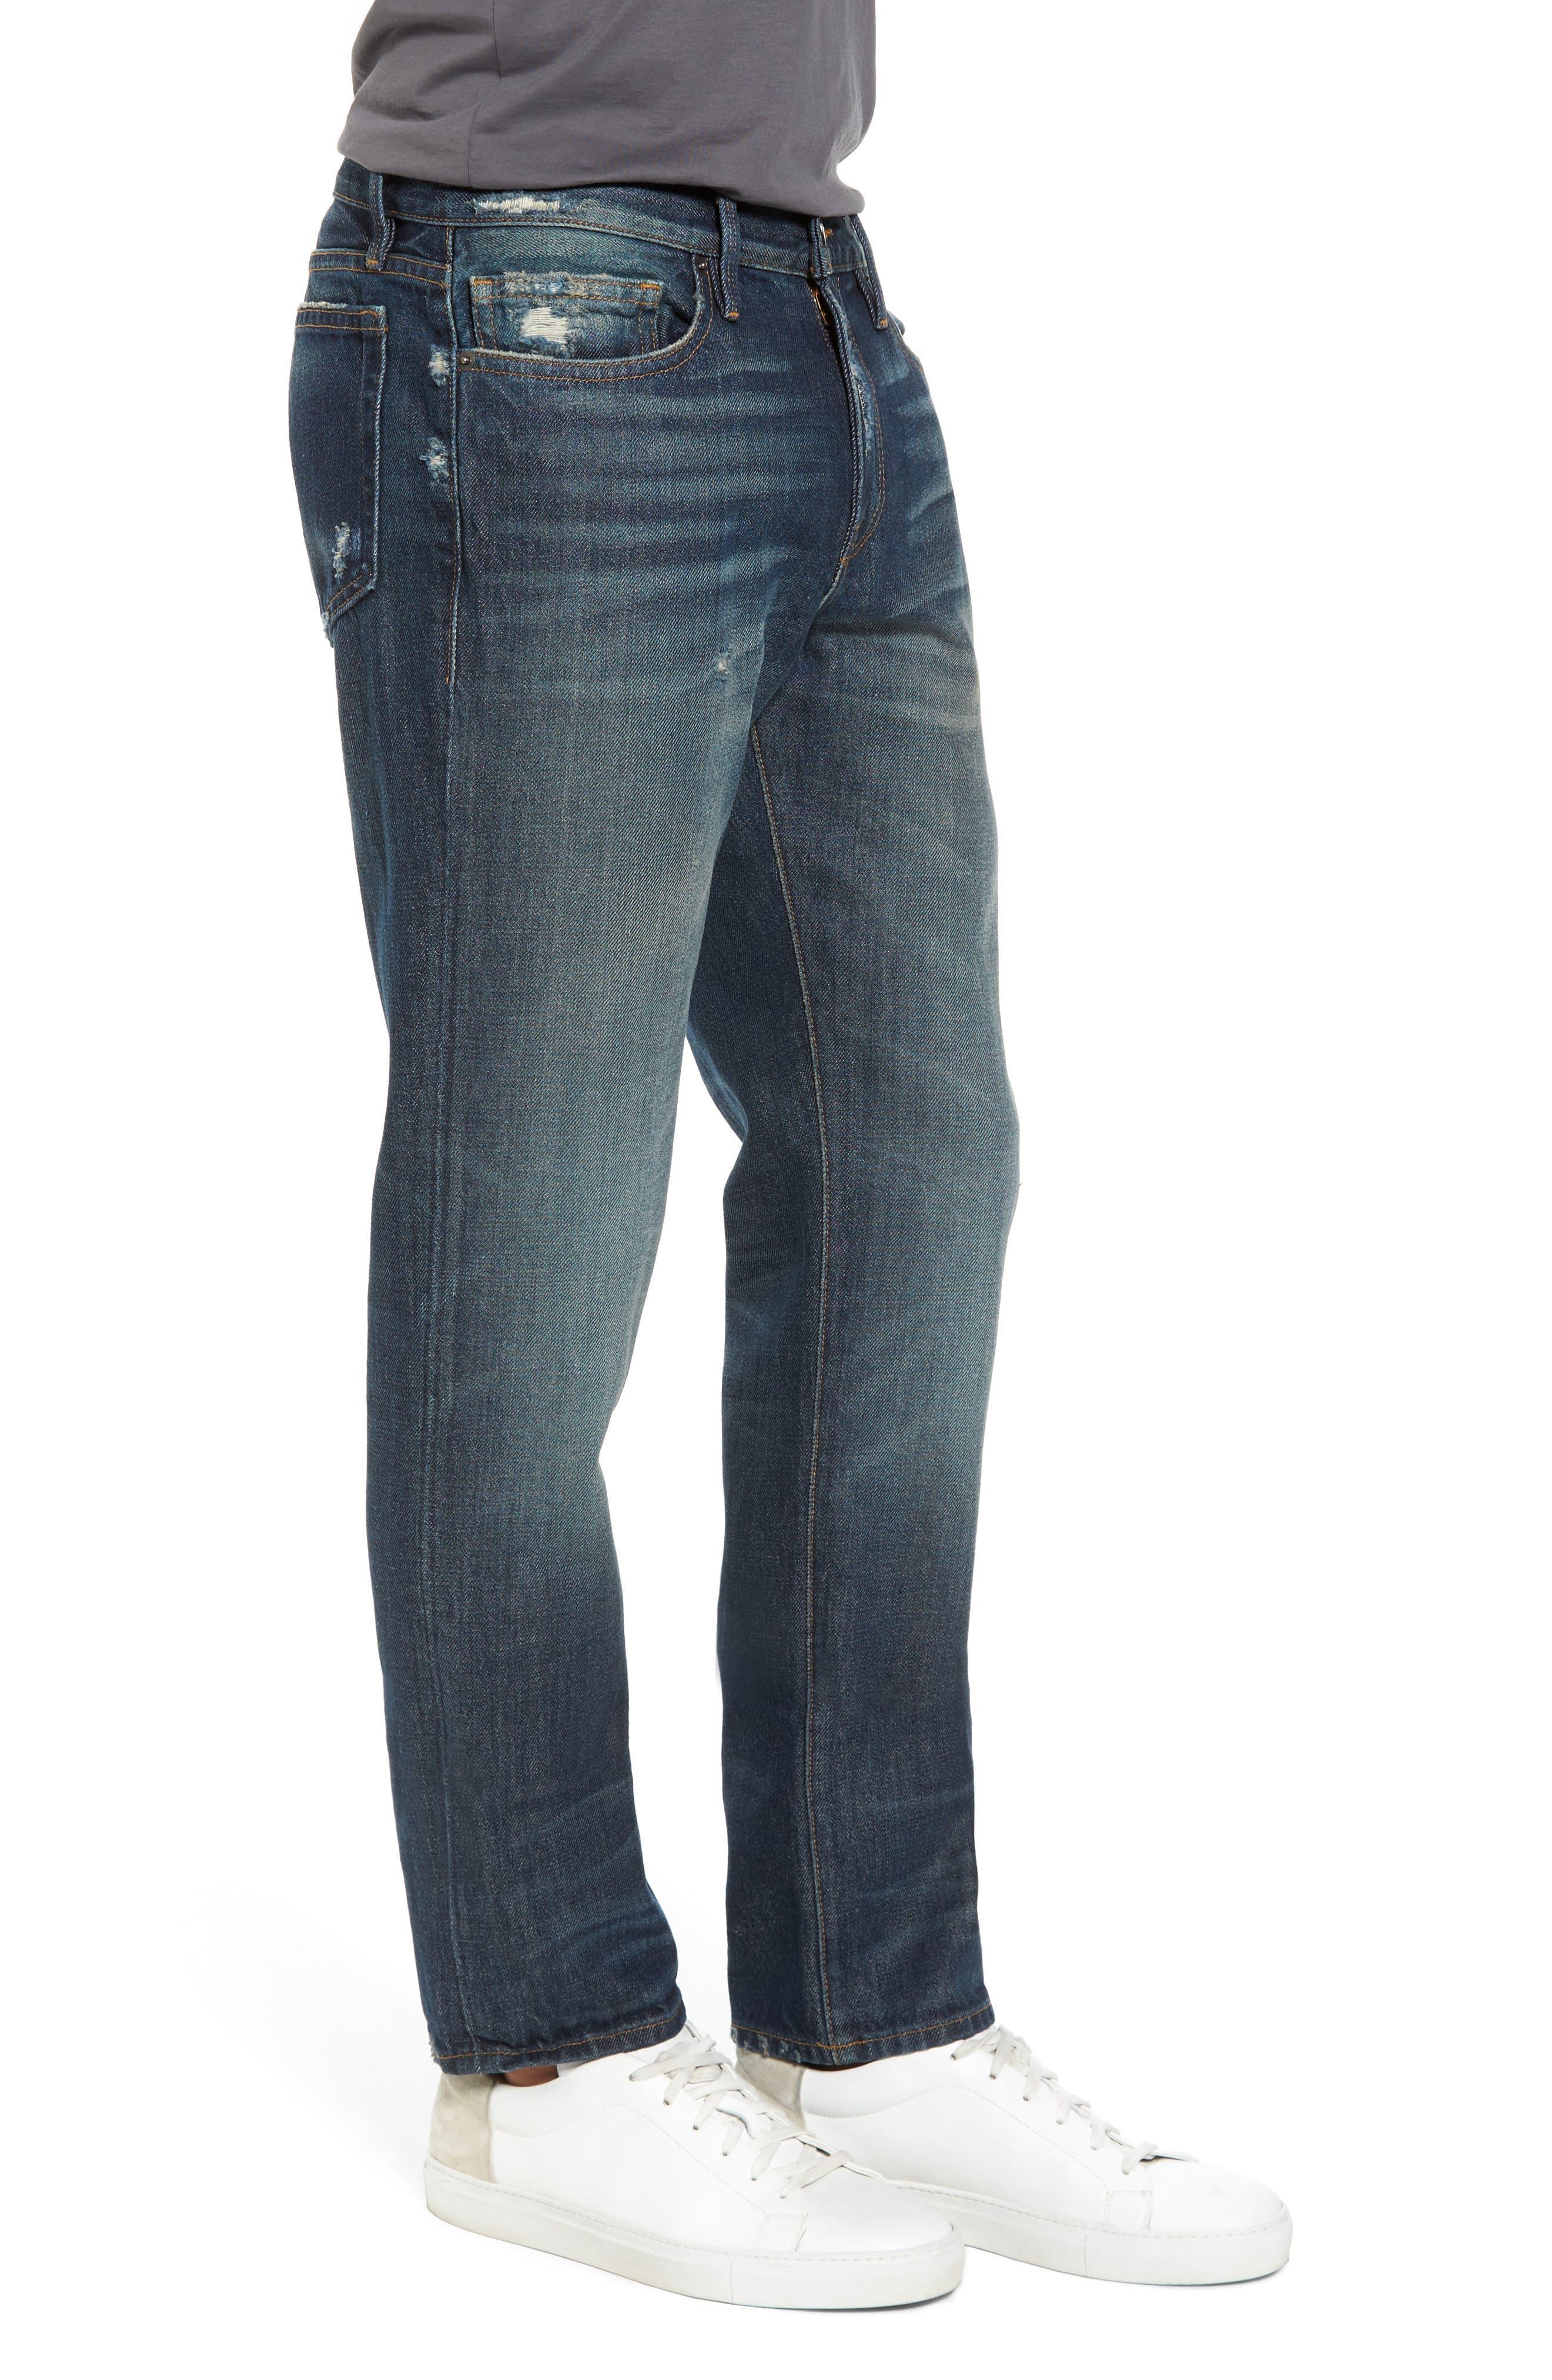 L'Homme Slim Fit Jeans,                             Alternate thumbnail 3, color,                             Bunker